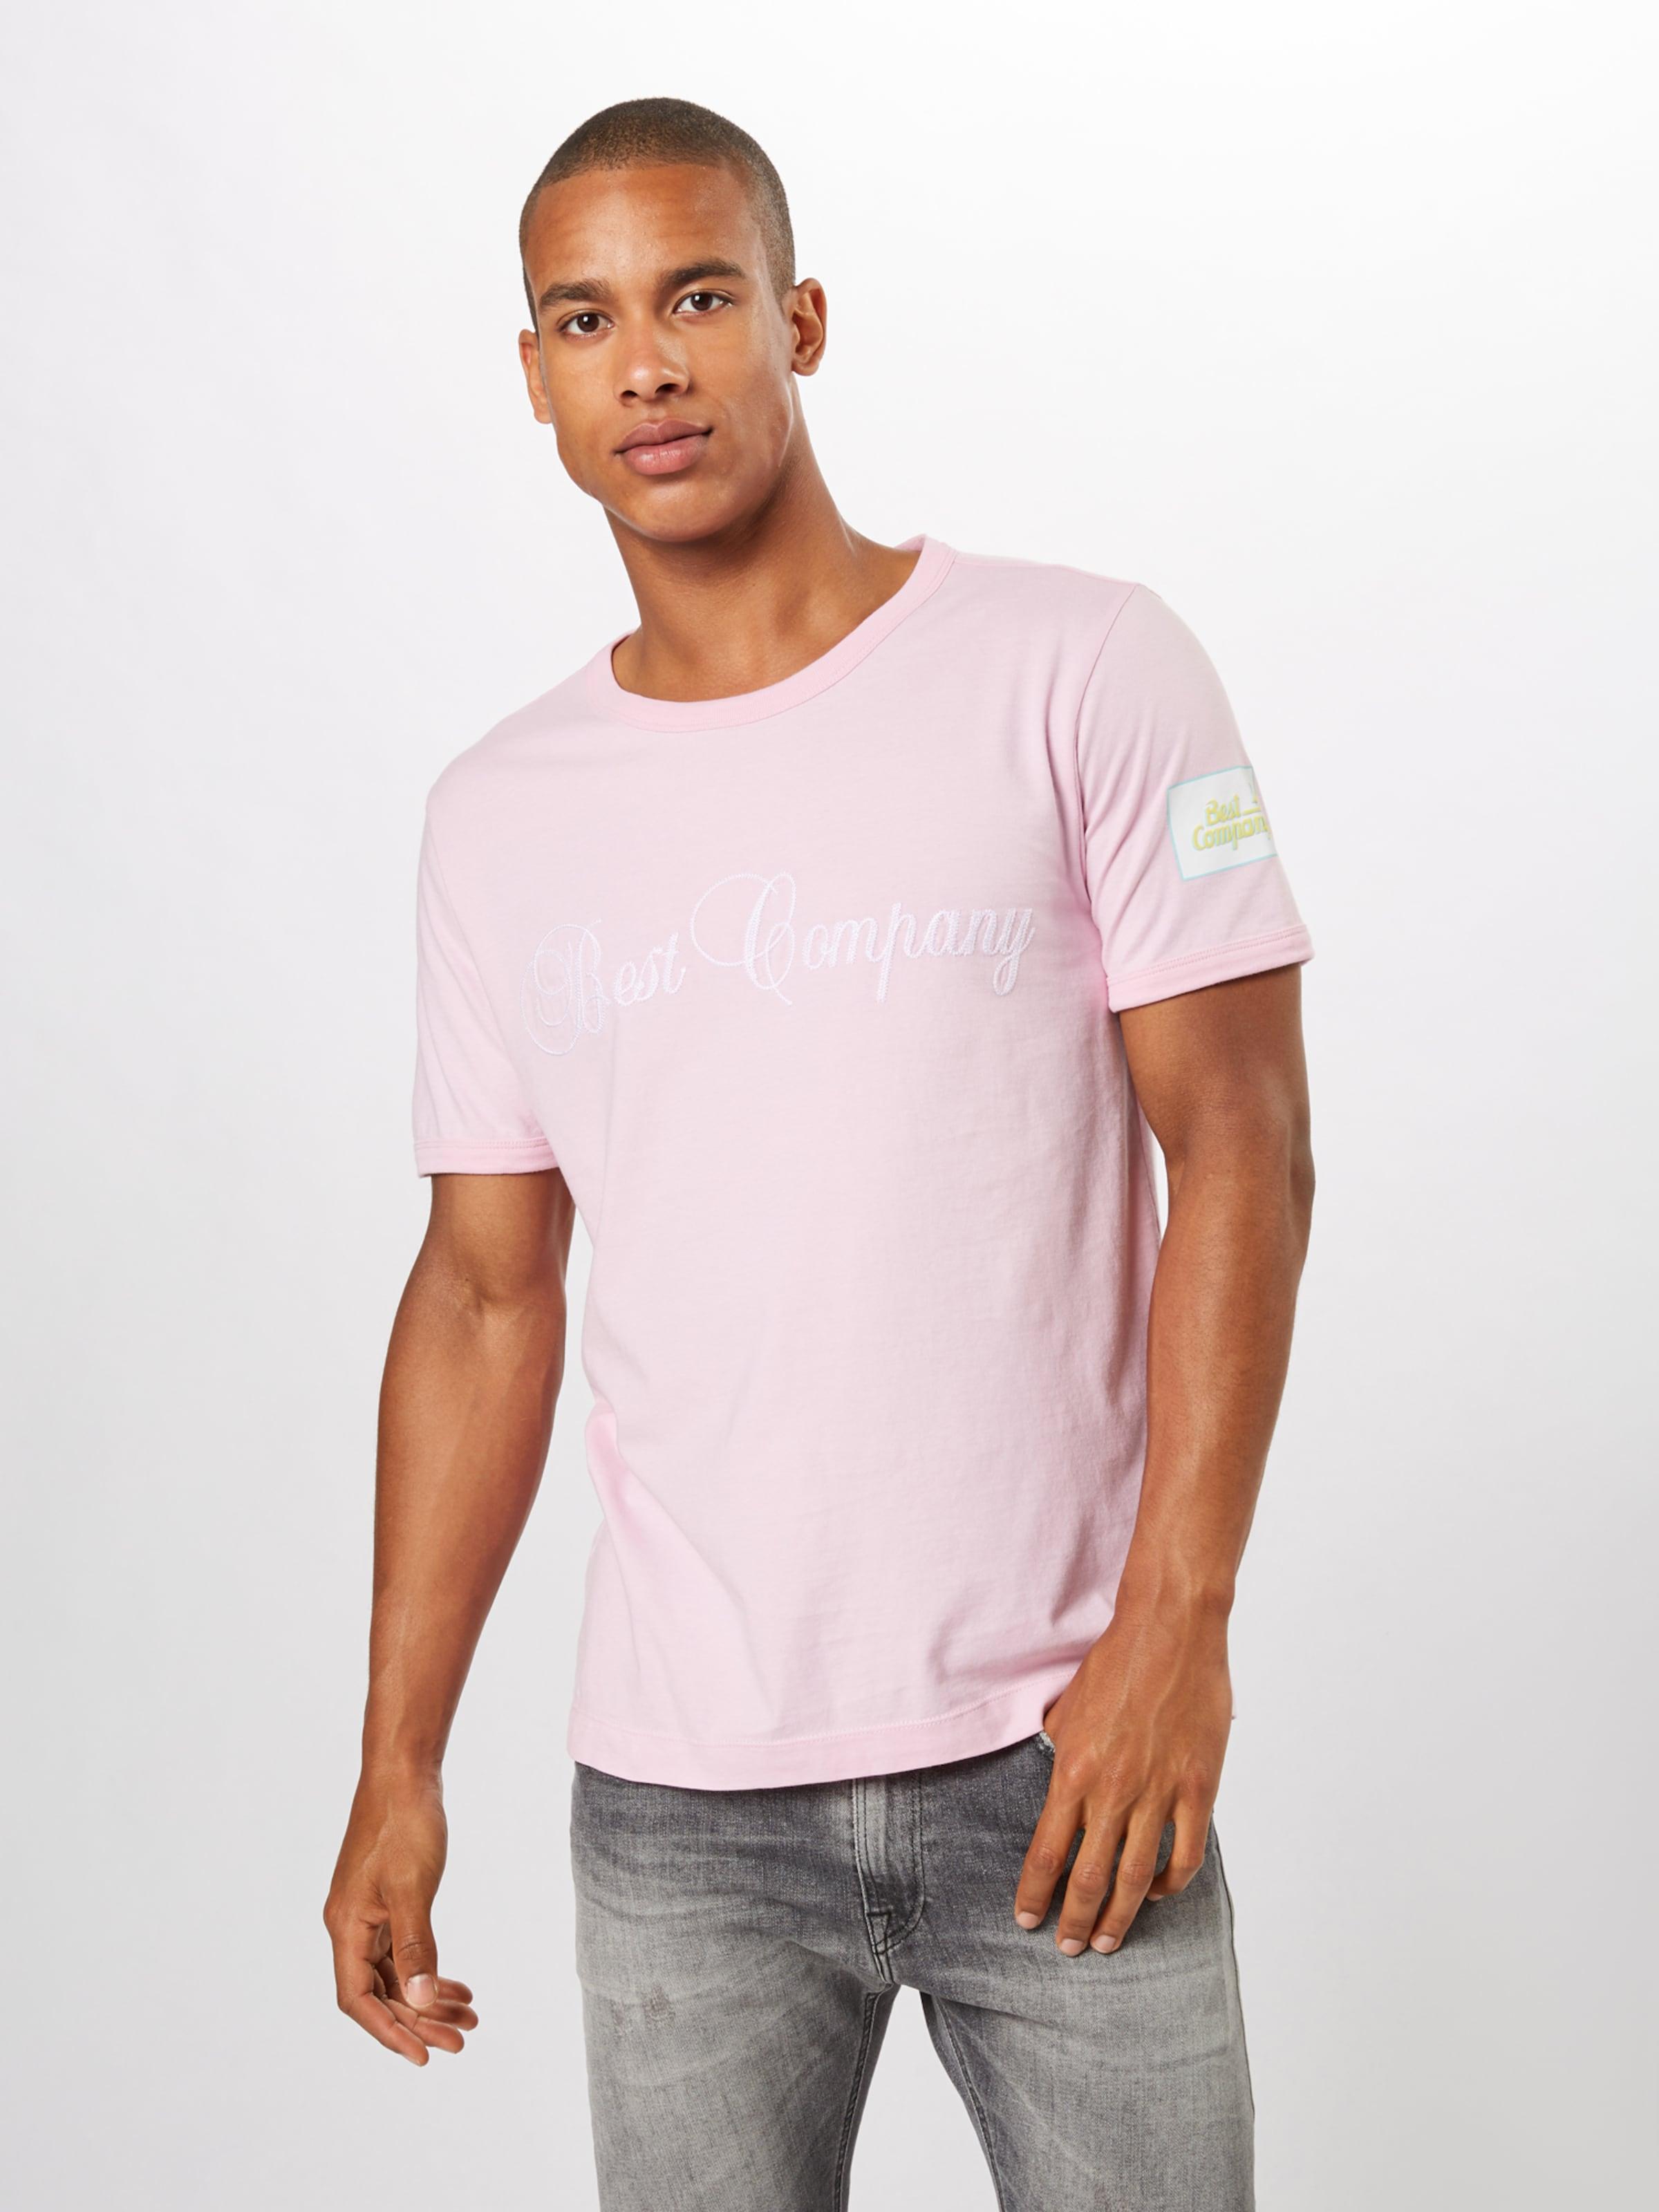 Rosa Best Company Weiß HellblauGelb shirt T In dWQCxBroeE